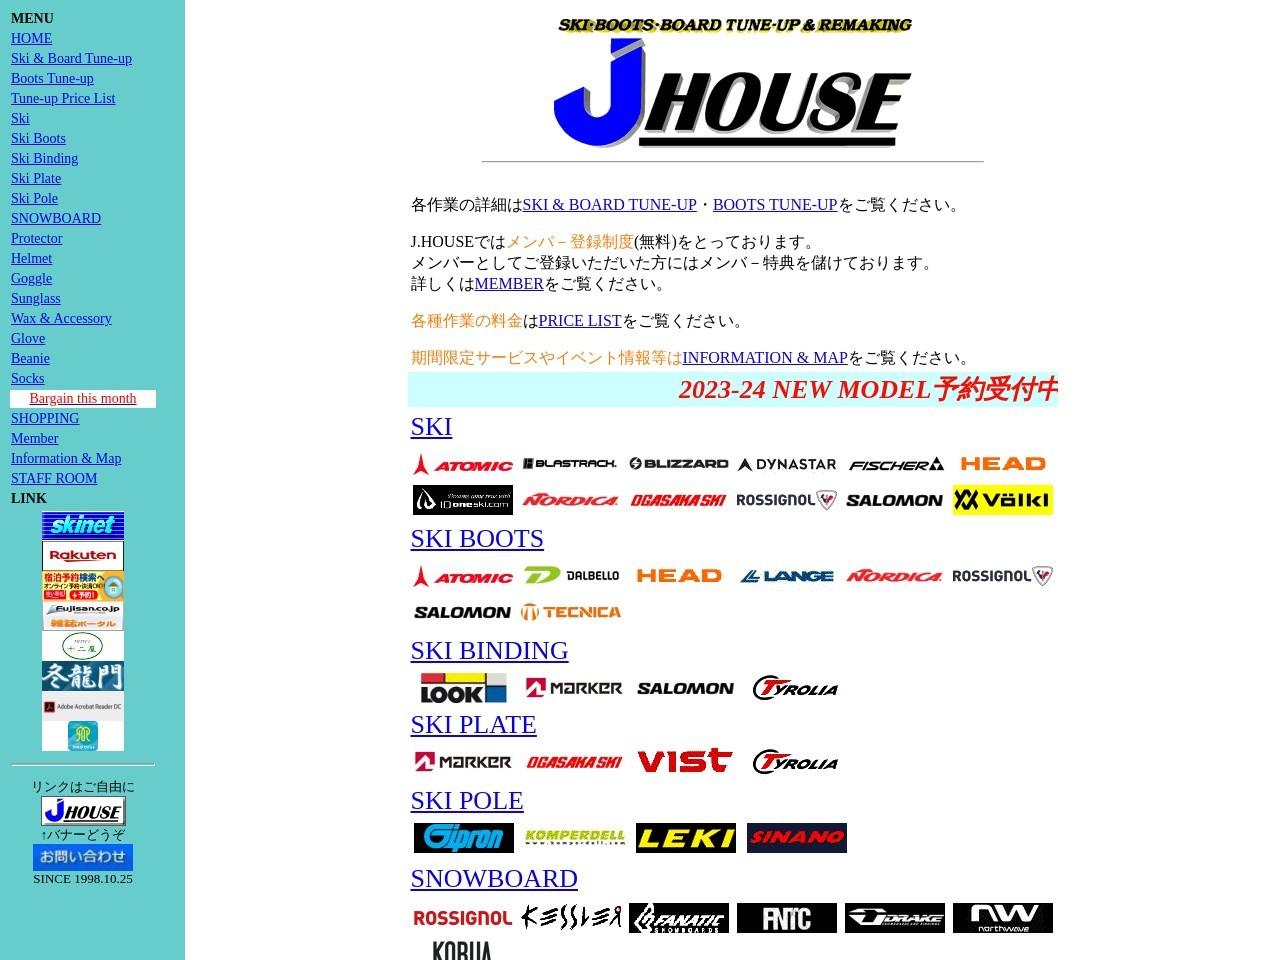 J.HOUSE